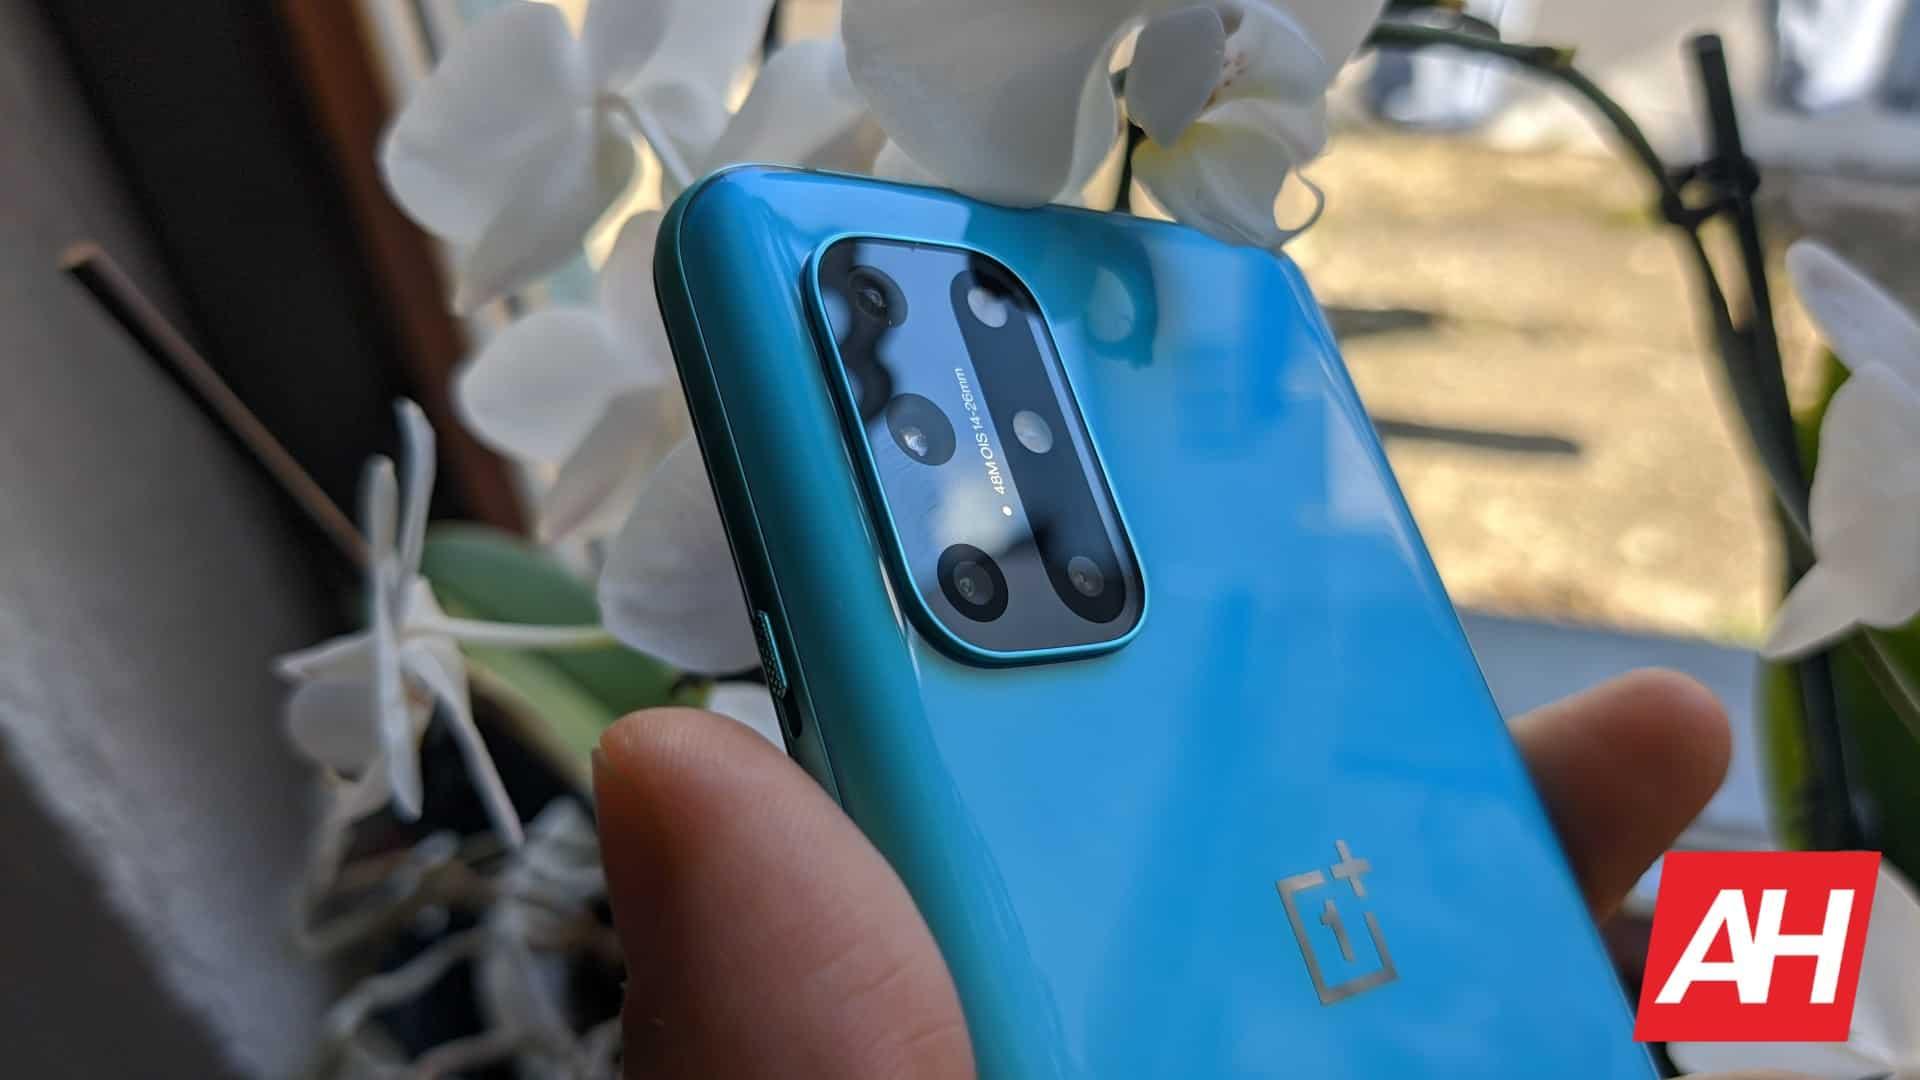 AH OnePlus 8T image 100